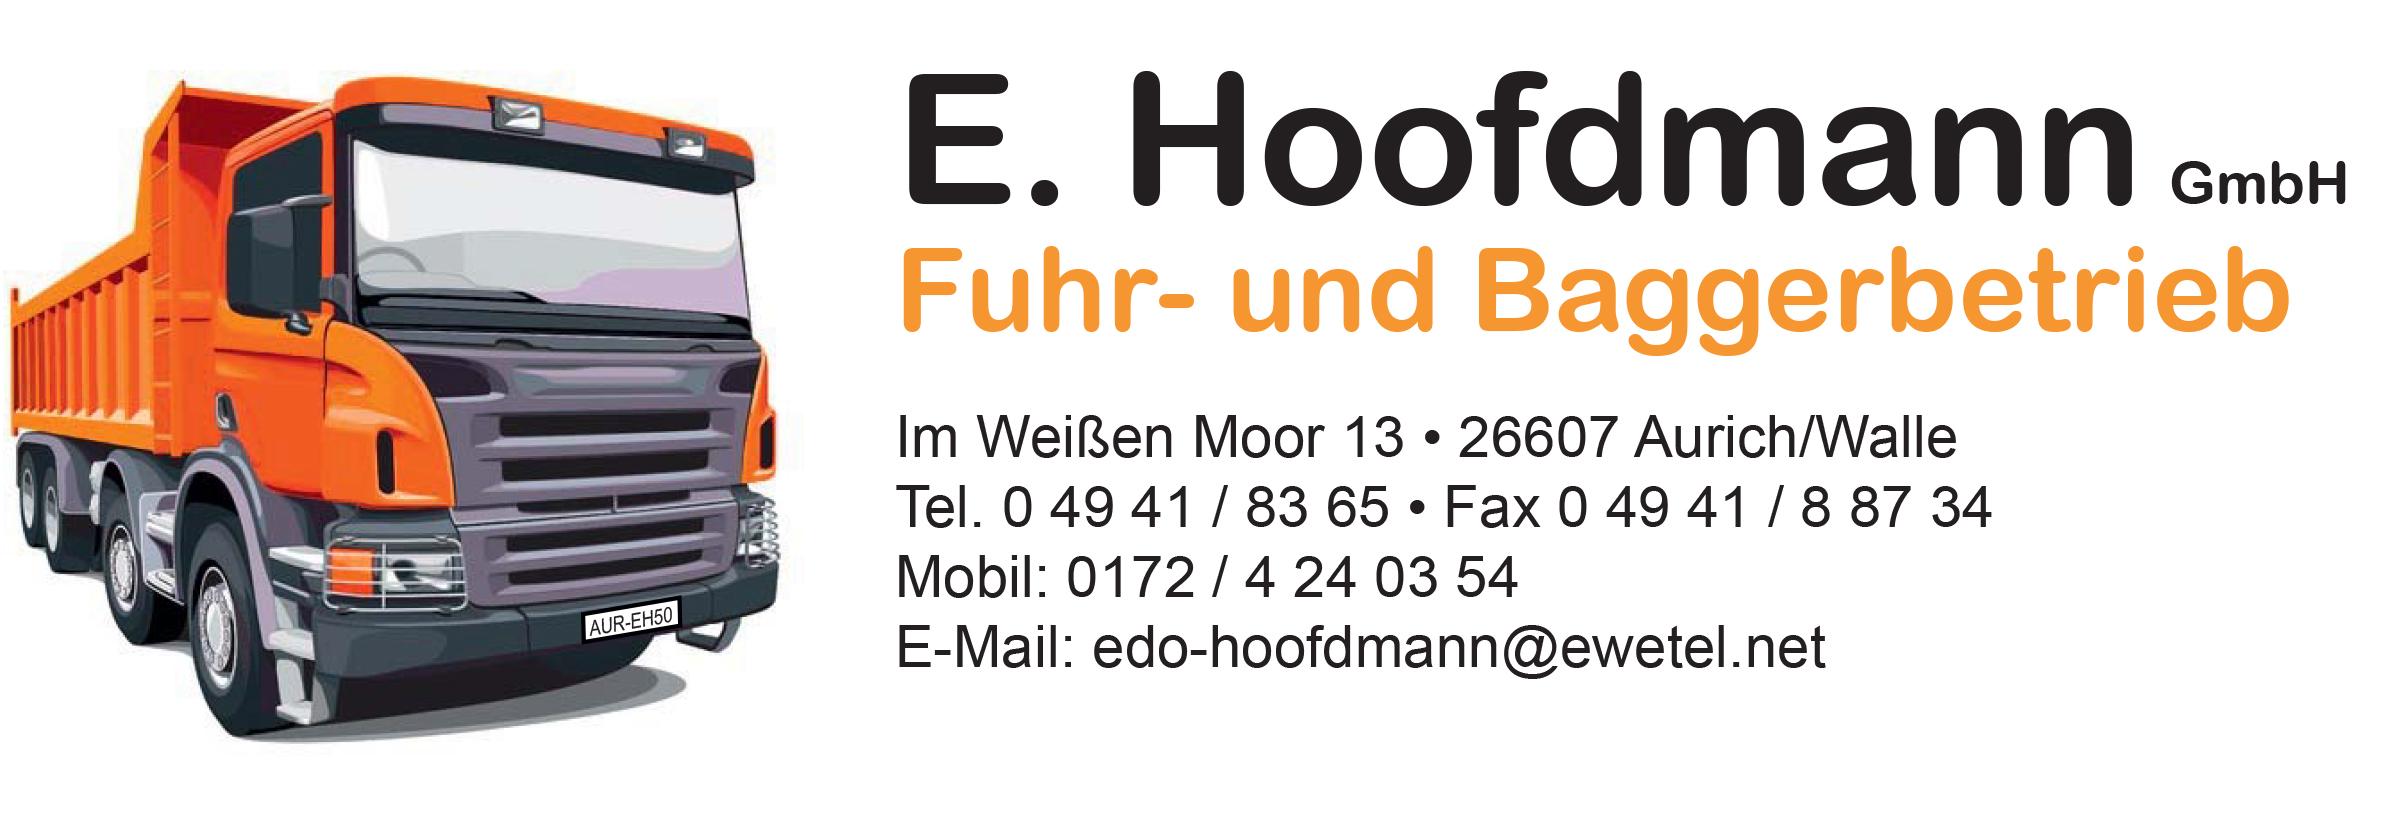 Briefumschlag_Hoofdmann_Rückseite.ai